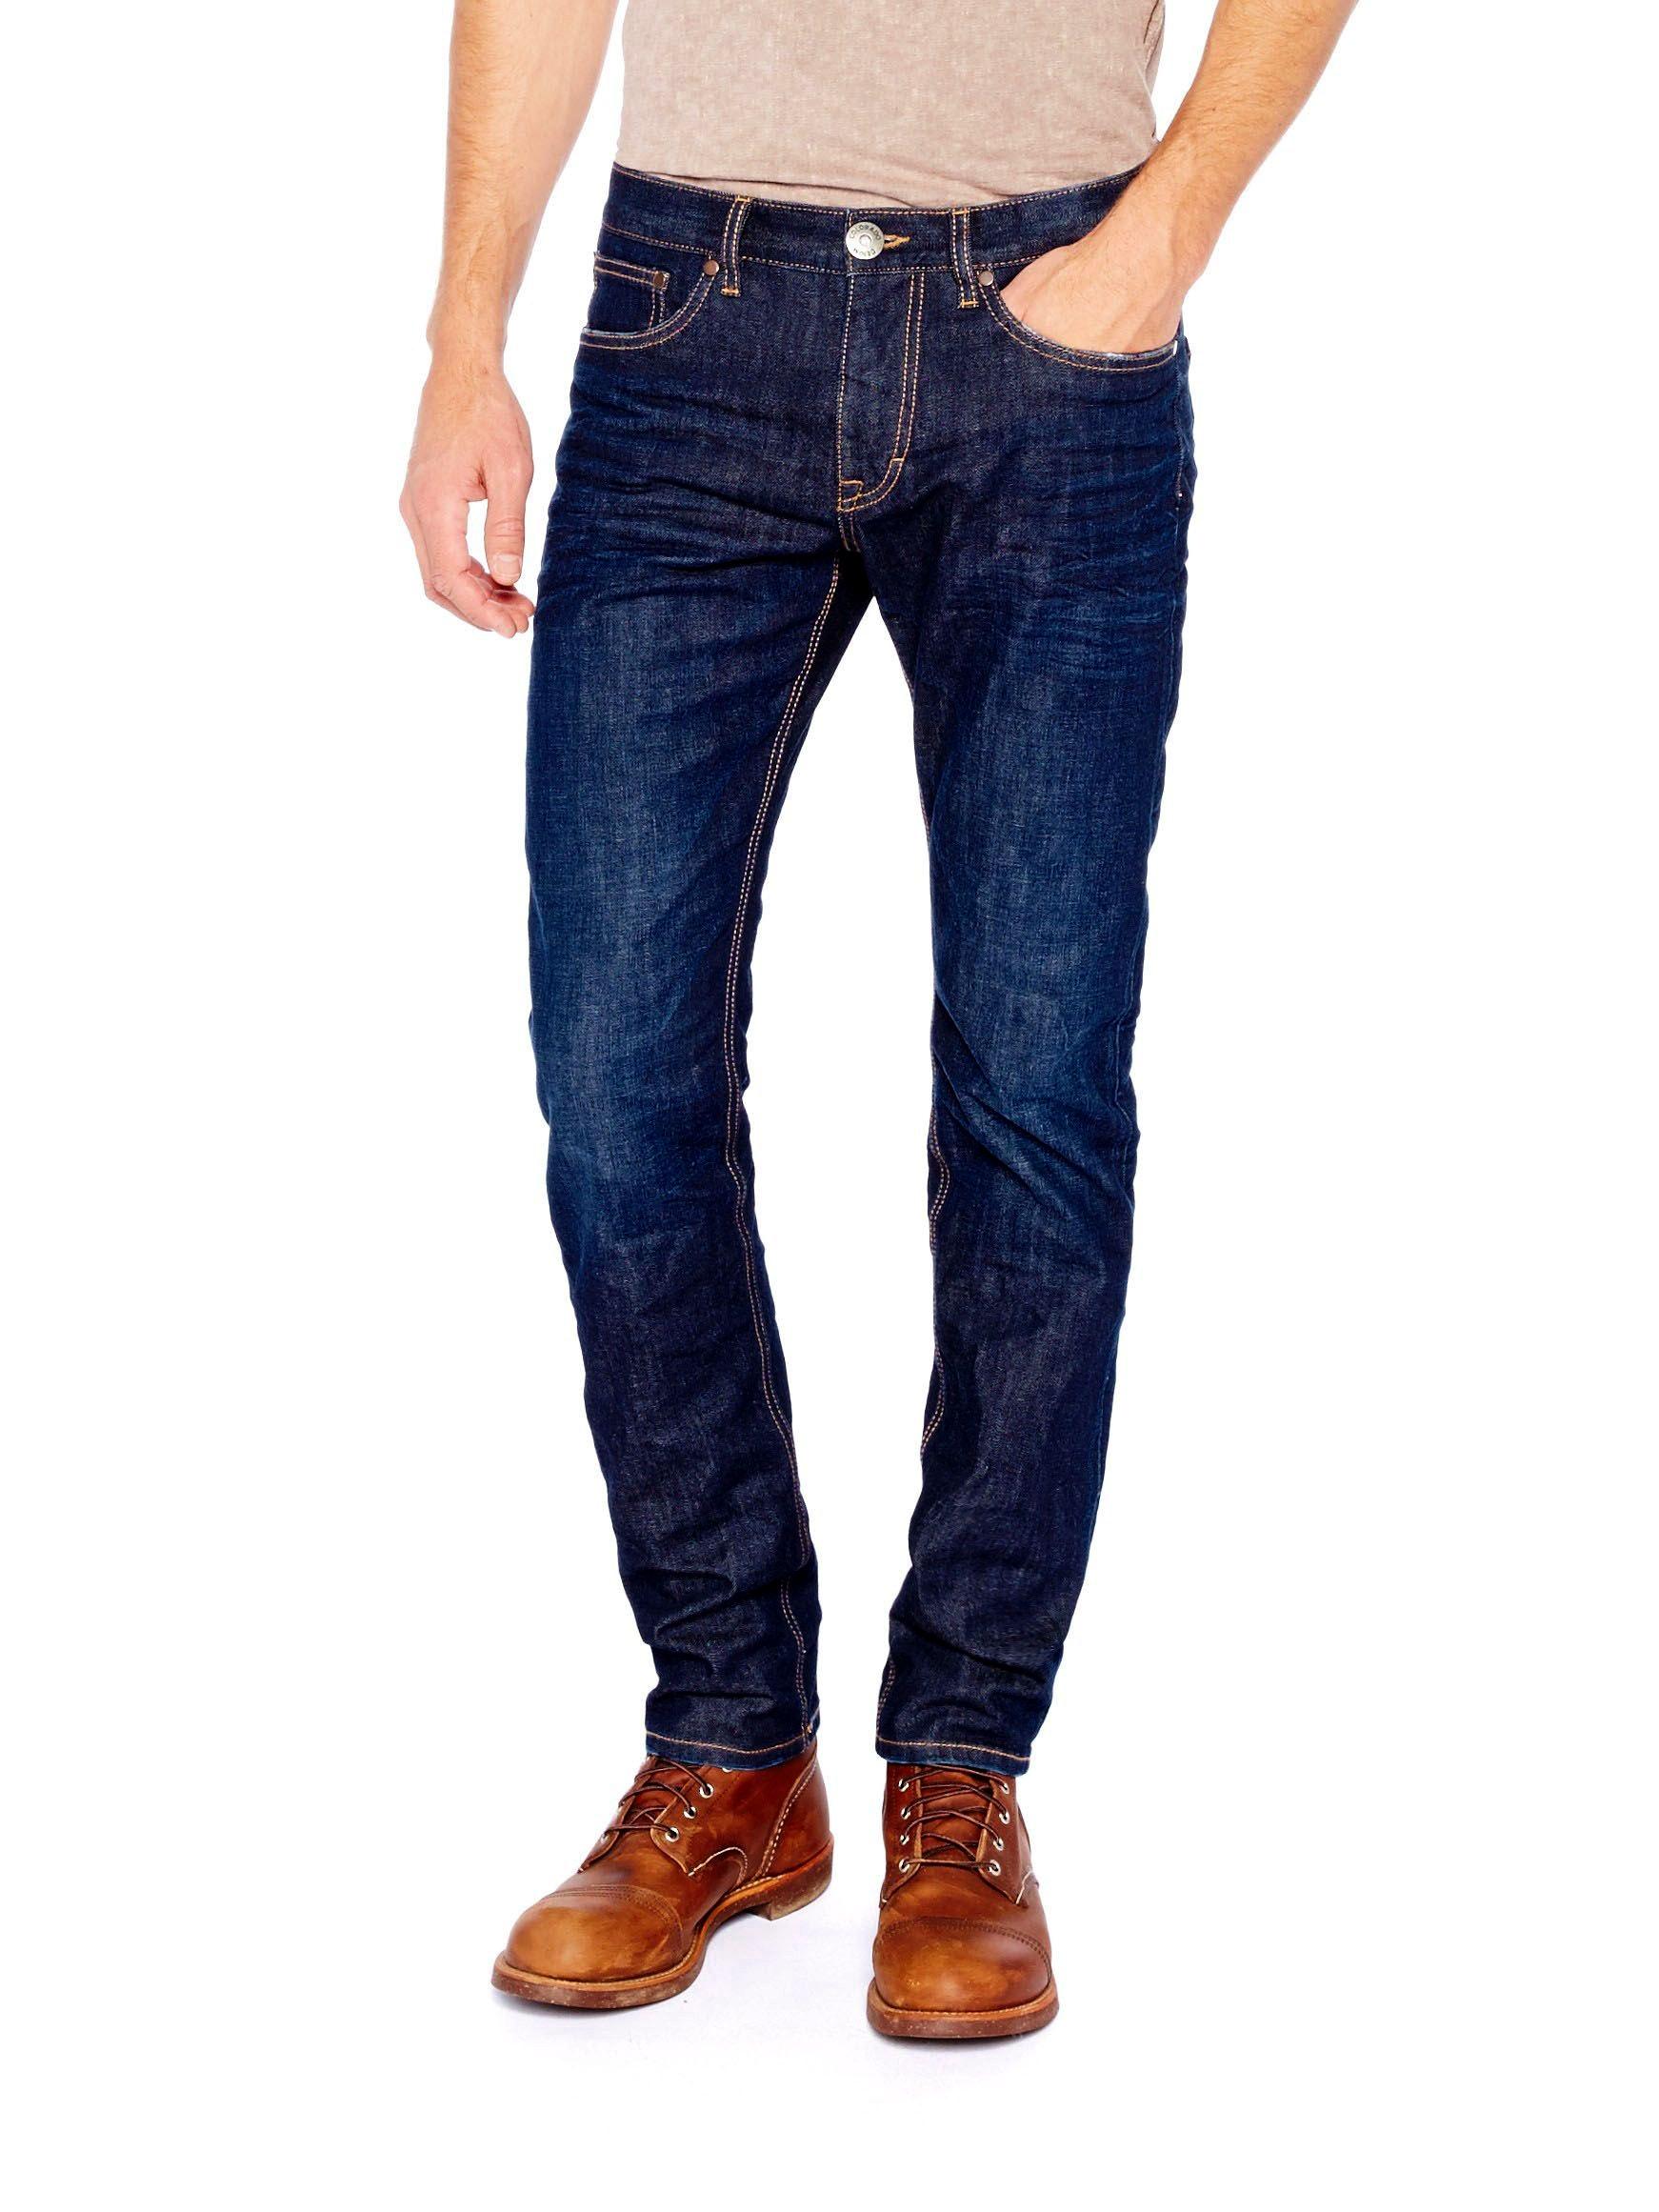 Revils Jeans 305 dark blue Stretch extra lang